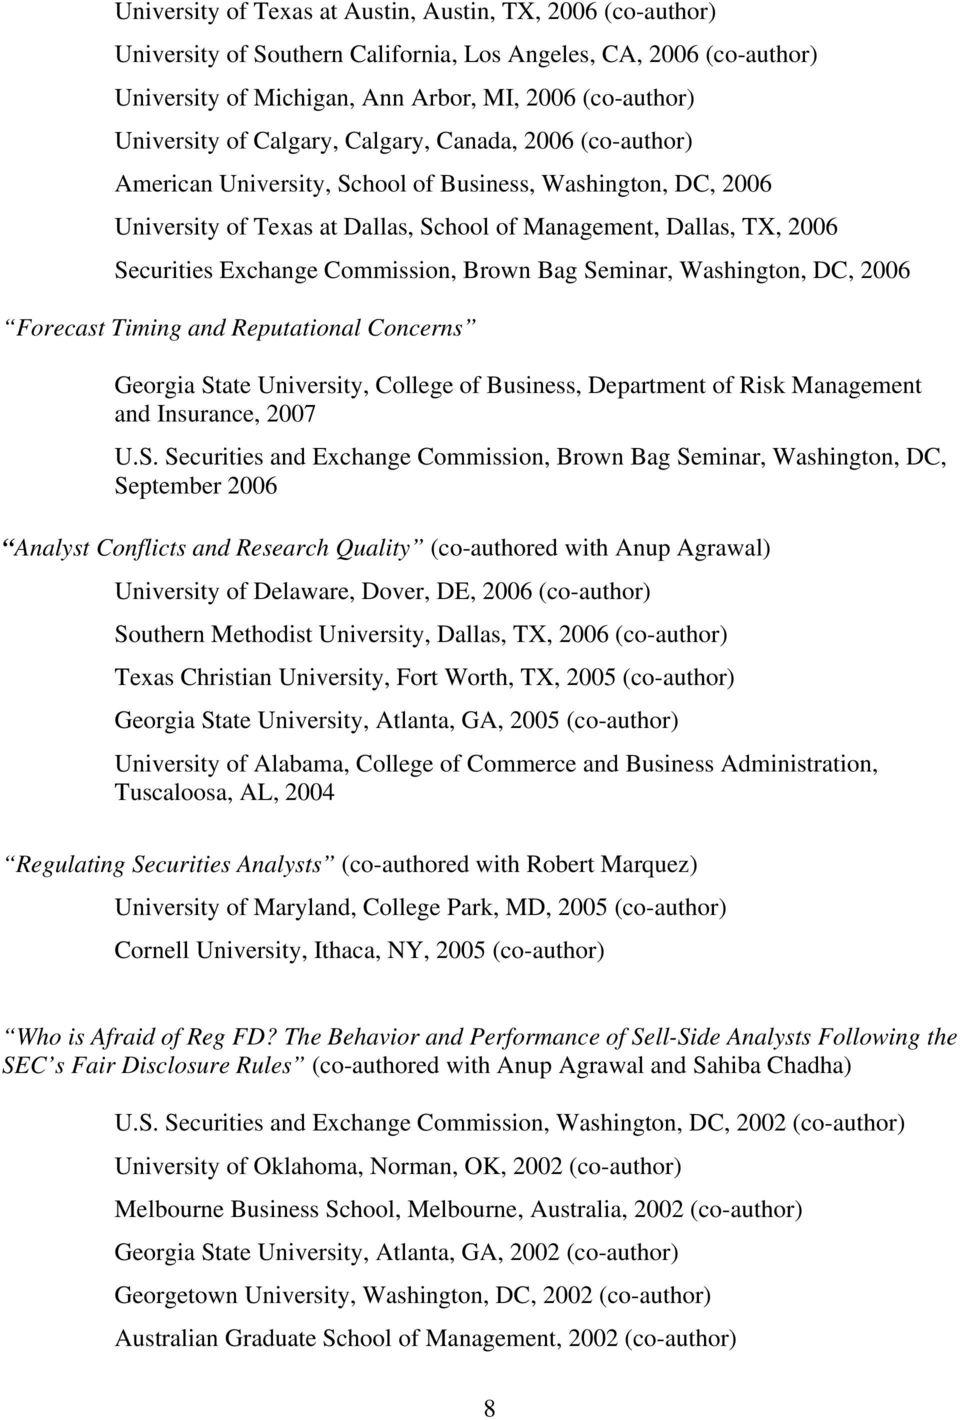 Mark A. Chen. J. Mack Robinson College Of Business Georgia Pertaining To Georgia State University Semester Start Date 2004 – 2005